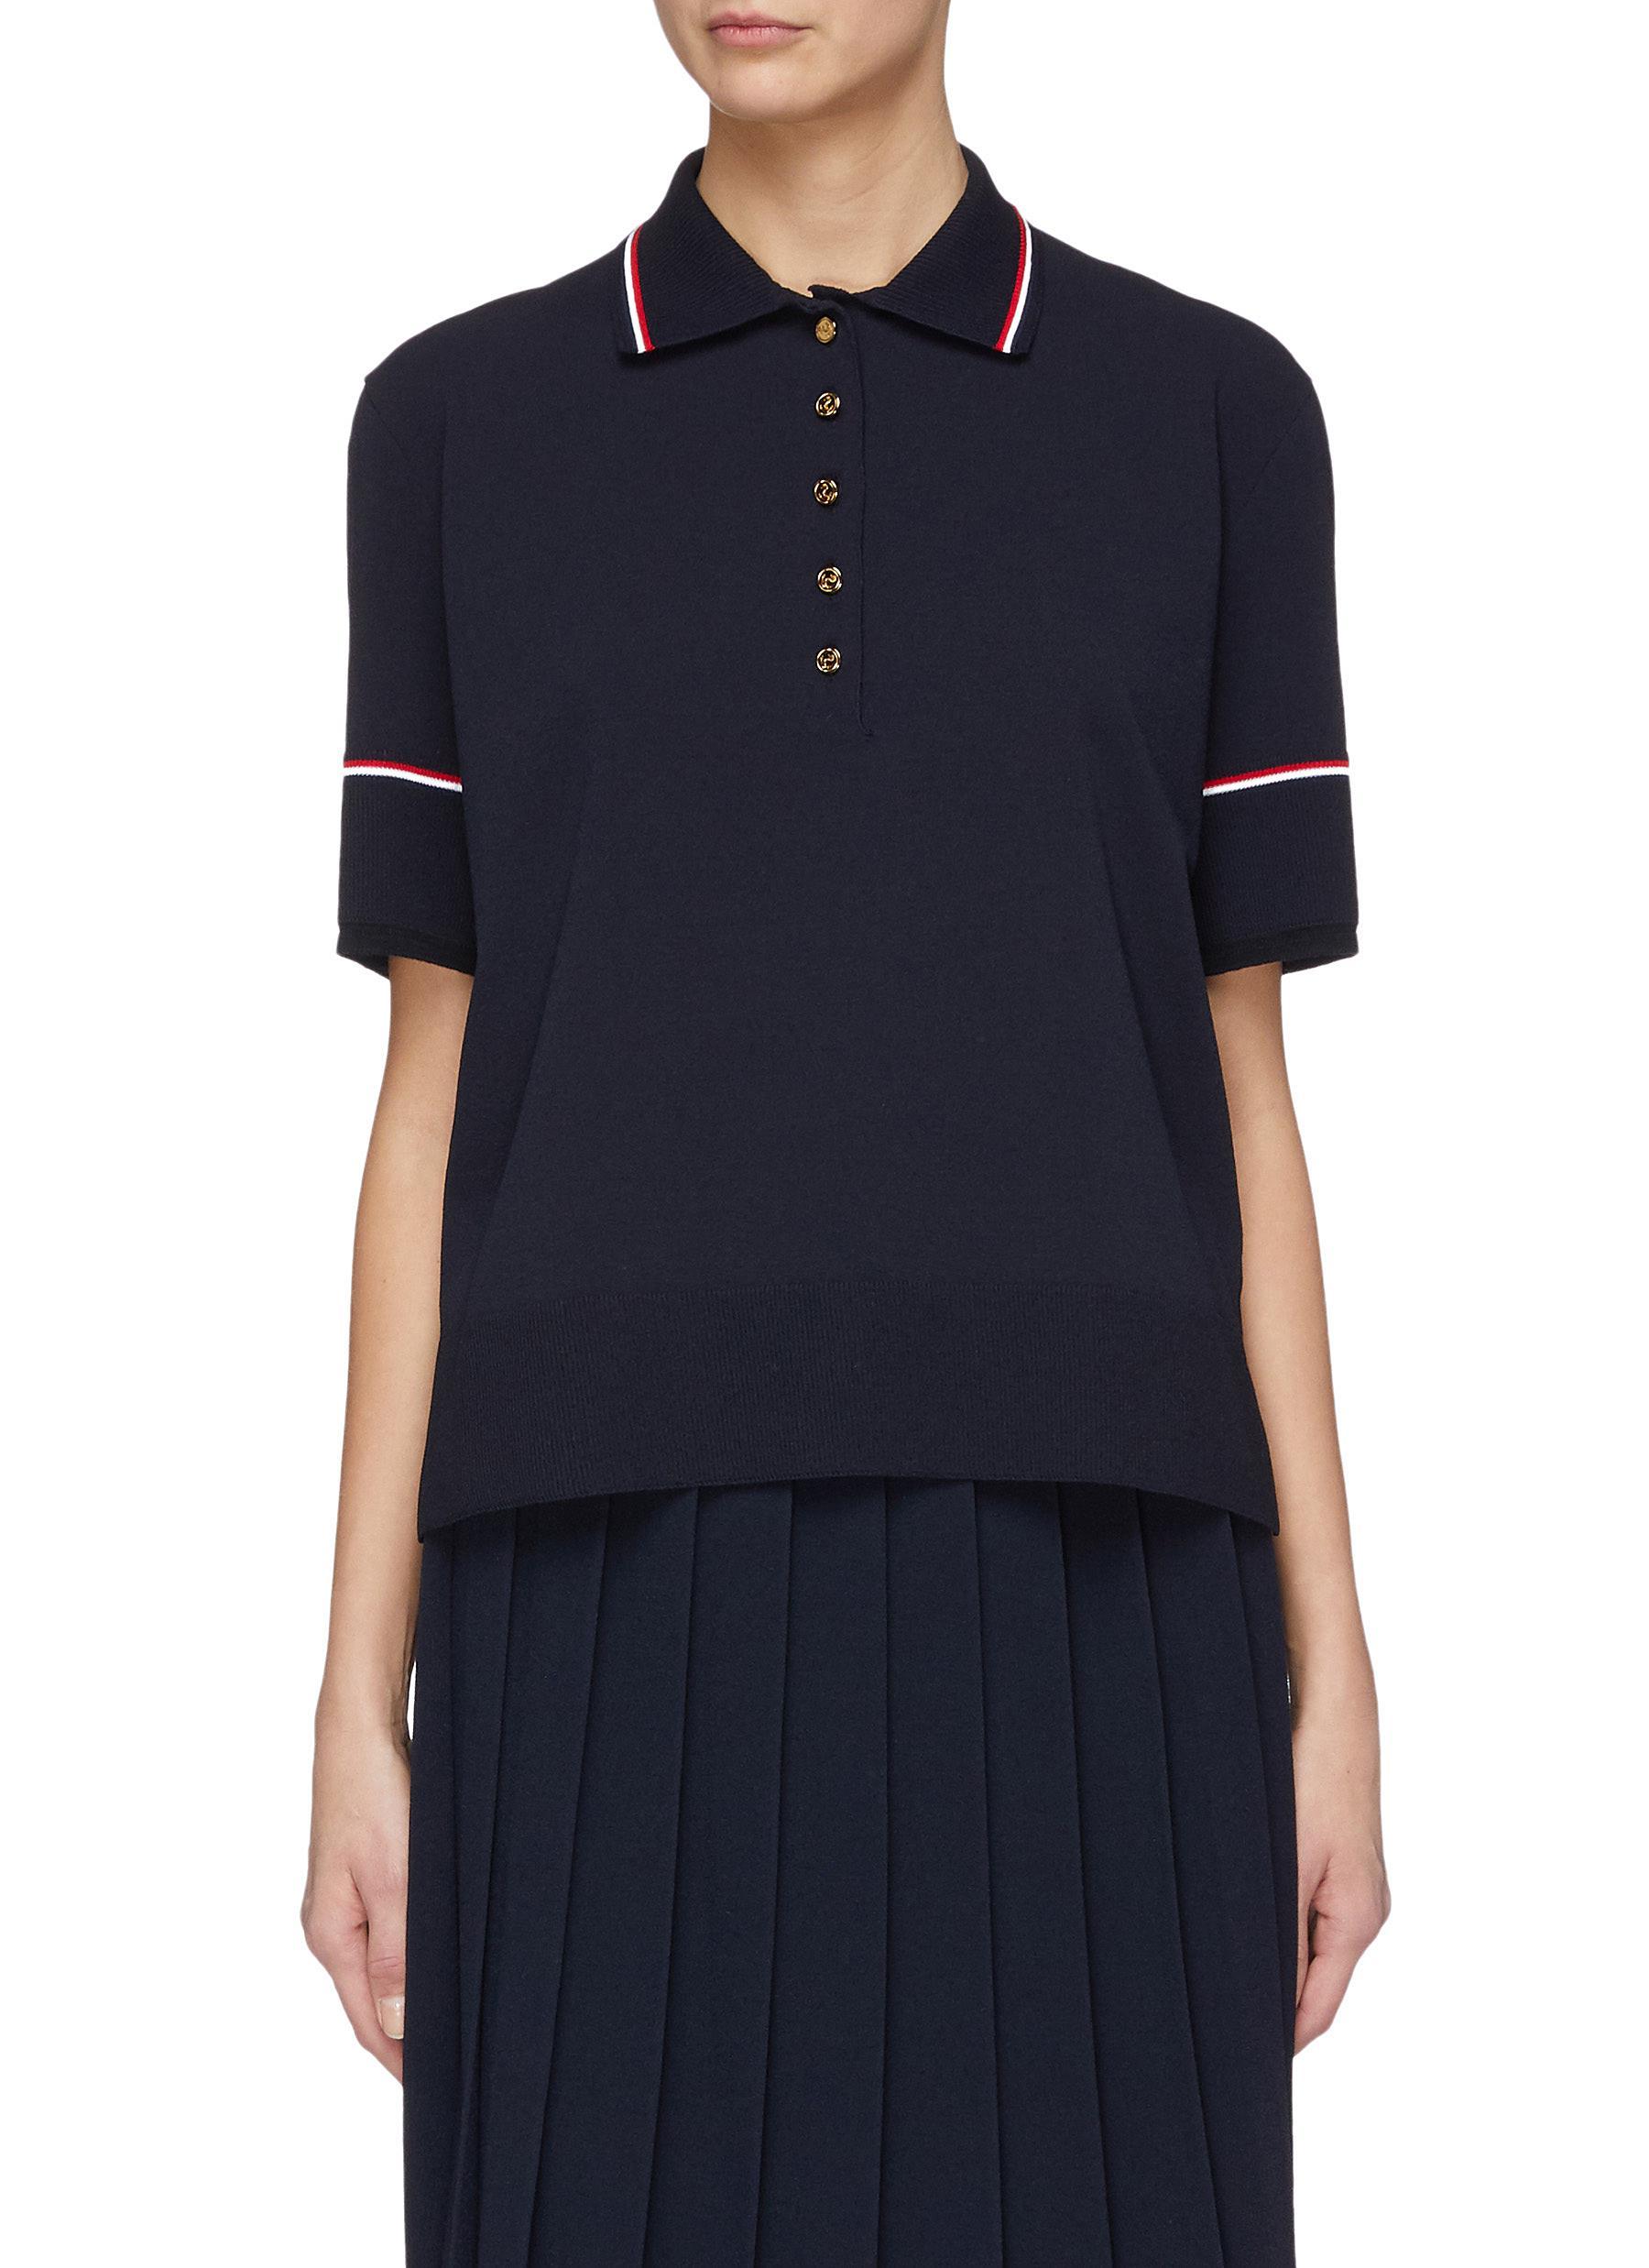 1da737ba Main View - Click To Enlarge - Thom Browne - Stripe collar polo shirt